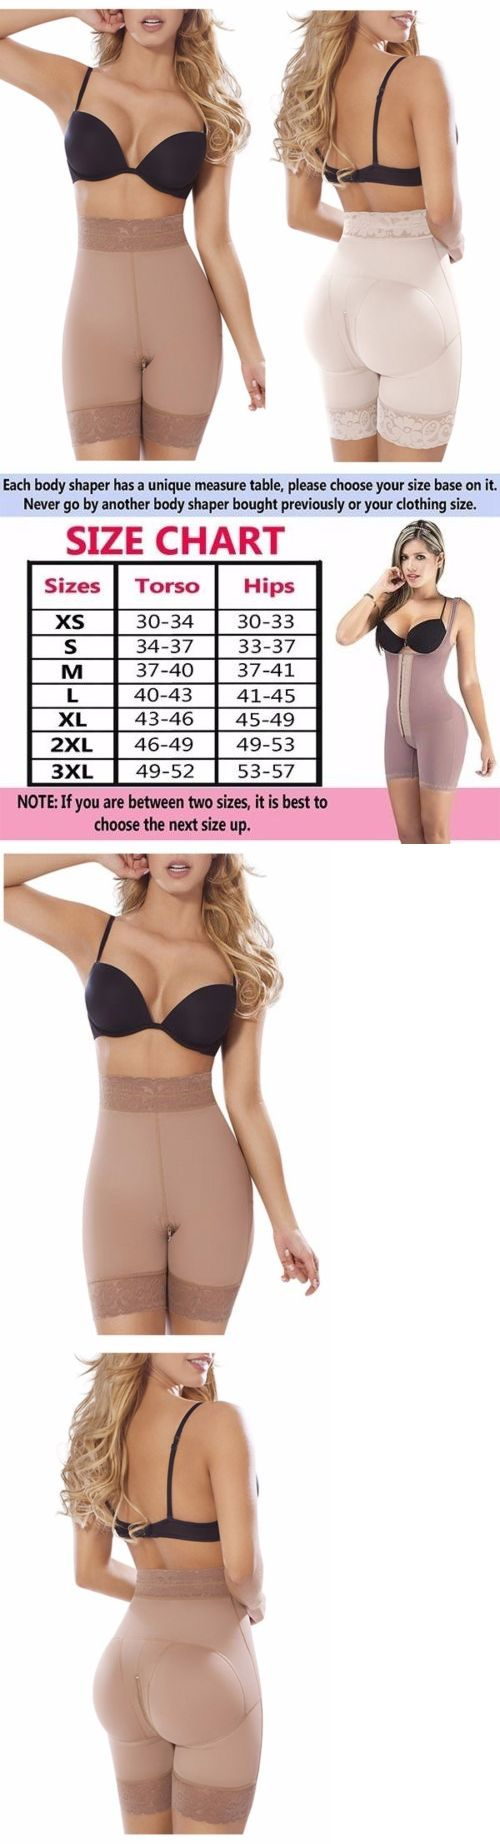 Shapewear 11530: Post-Surgery Girdle, Levanta Cola Body Shaper Panty Boxer, Fajas Colombianas -> BUY IT NOW ONLY: $44 on eBay!